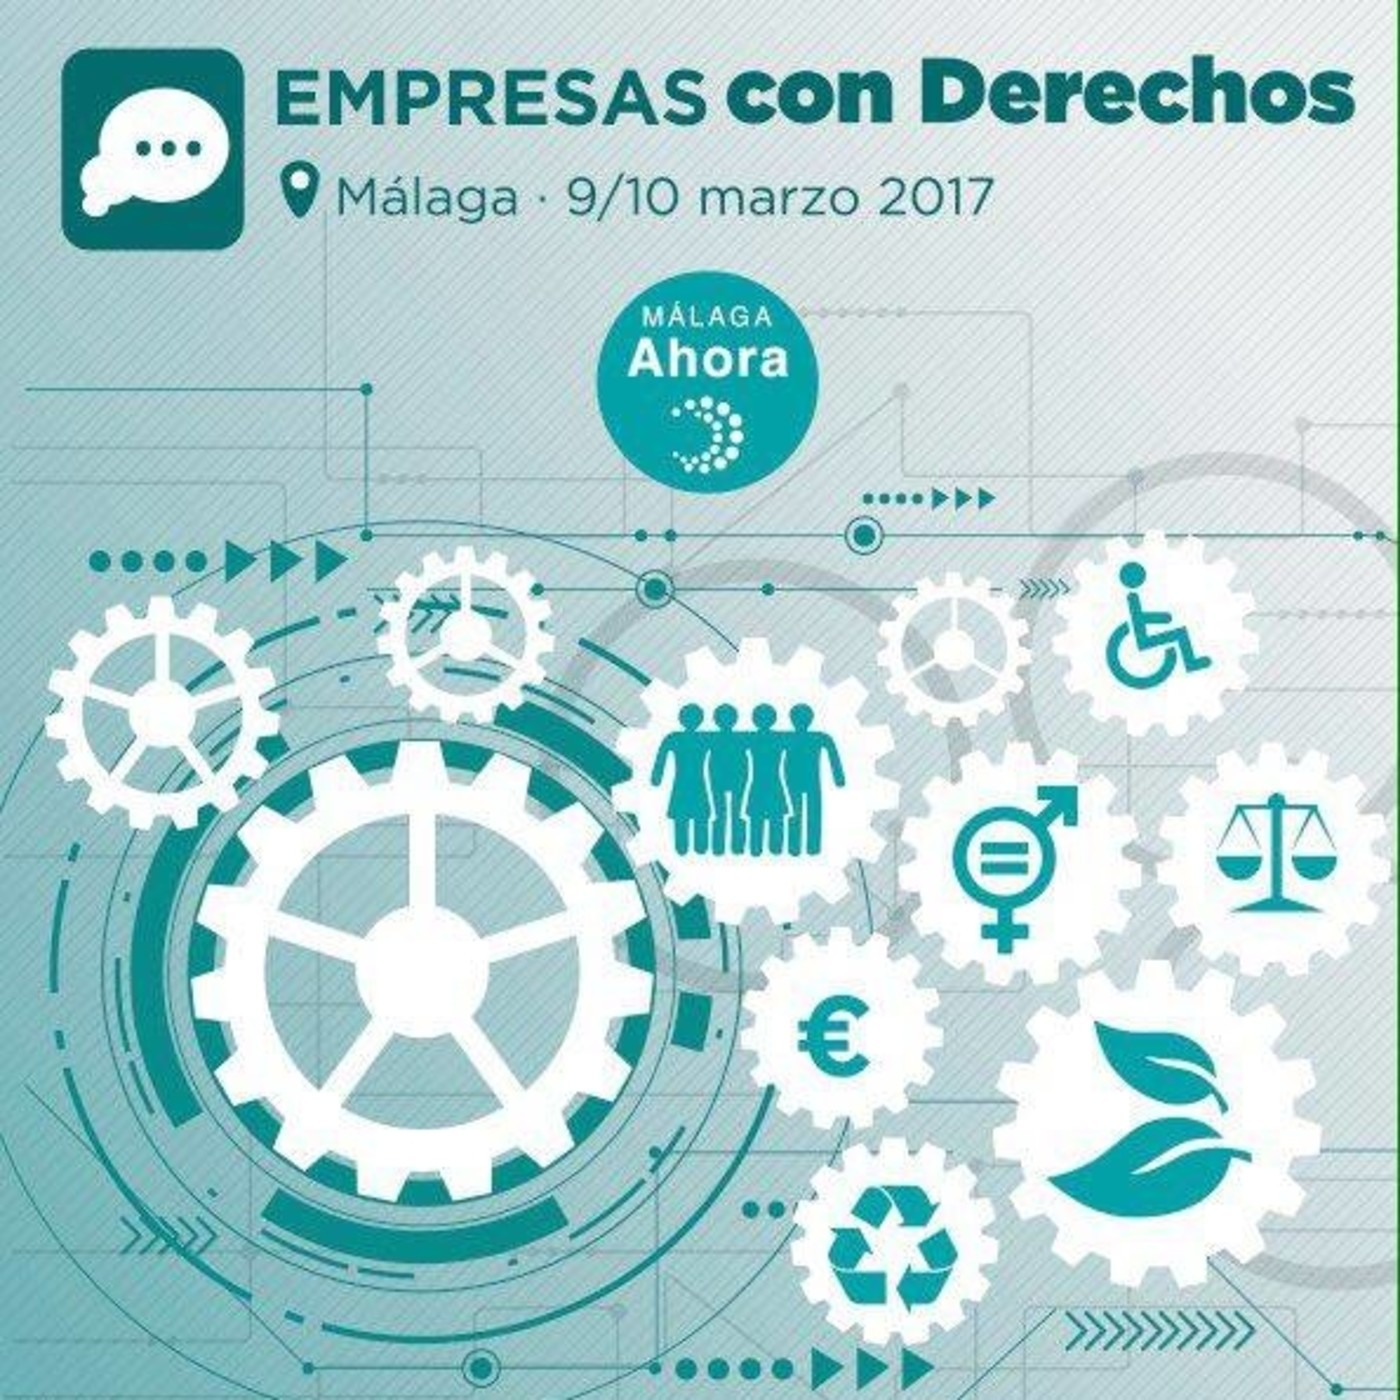 Jornadas economia social empresas con derechos d a 2 - Empresas constructoras en malaga ...